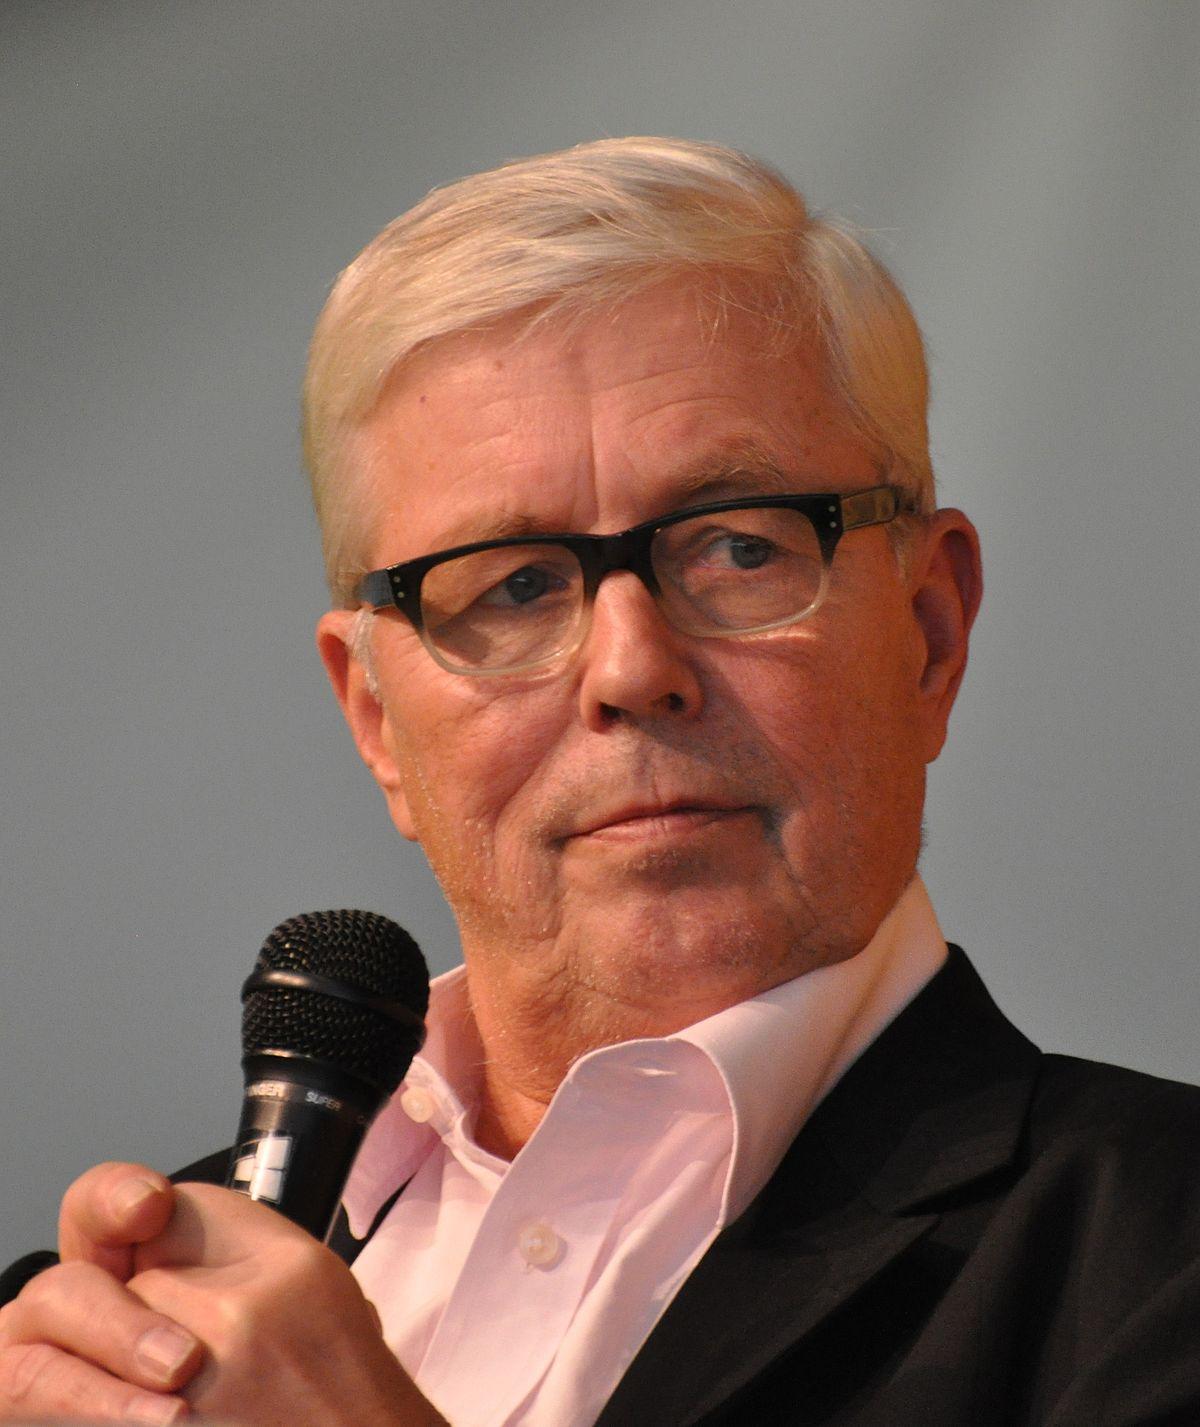 Janne Virkkunen